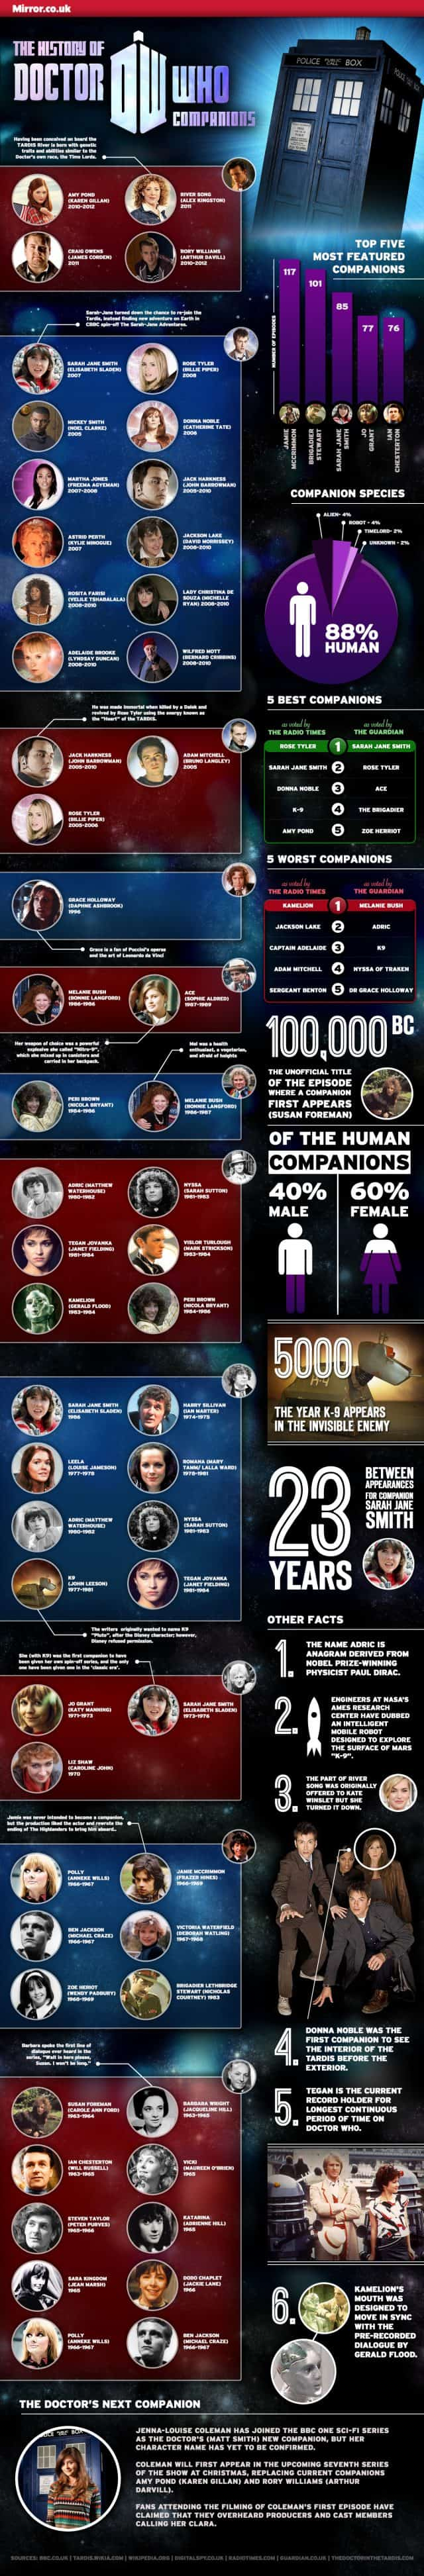 DrWho_infographic_Mirror-640x3891